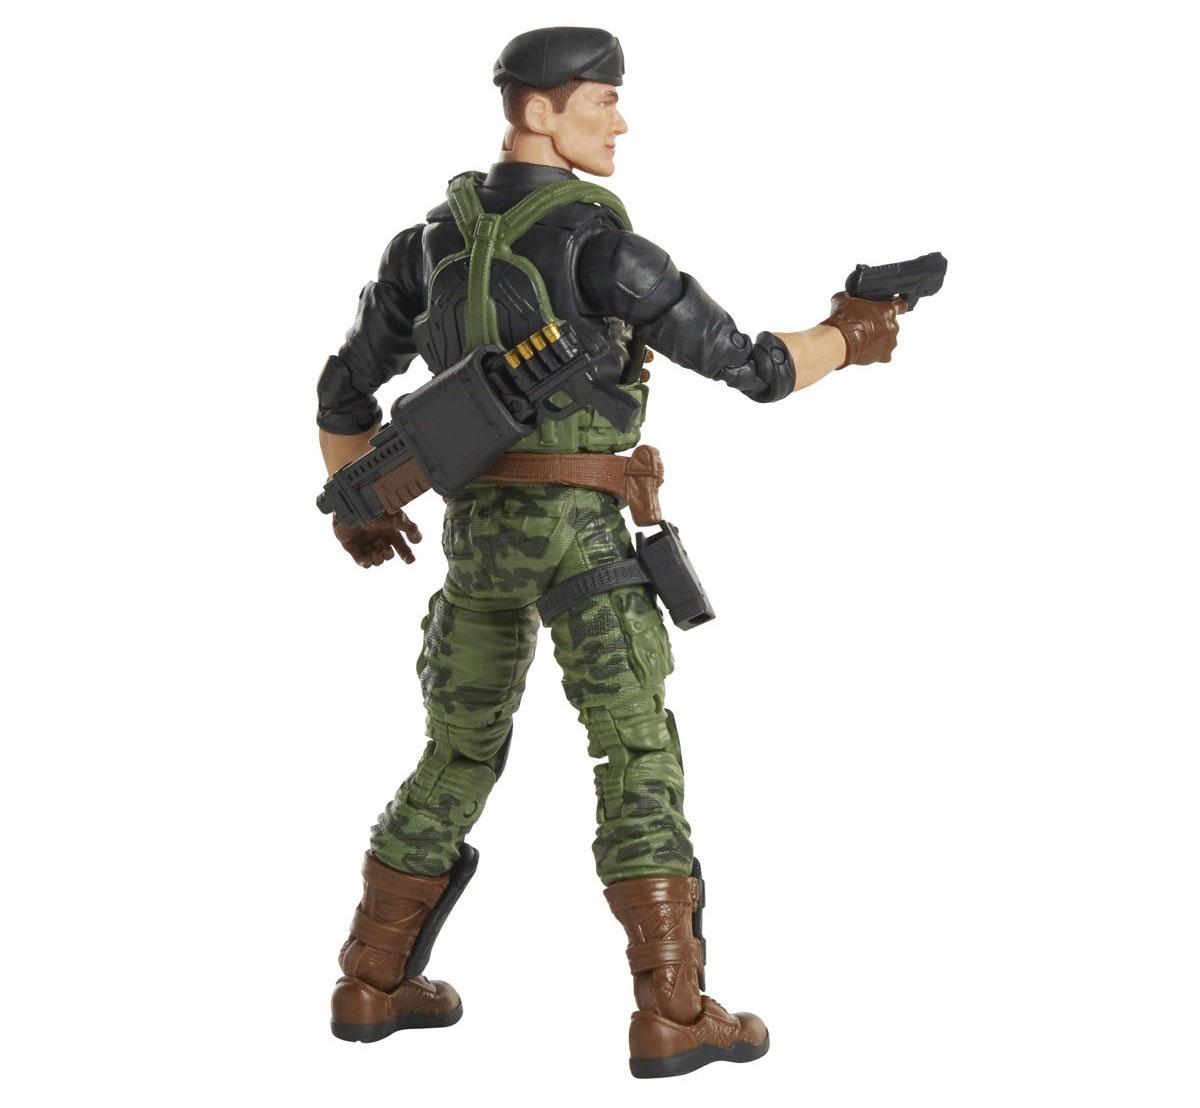 gi-joe-classified-series-flint-action-figure-7